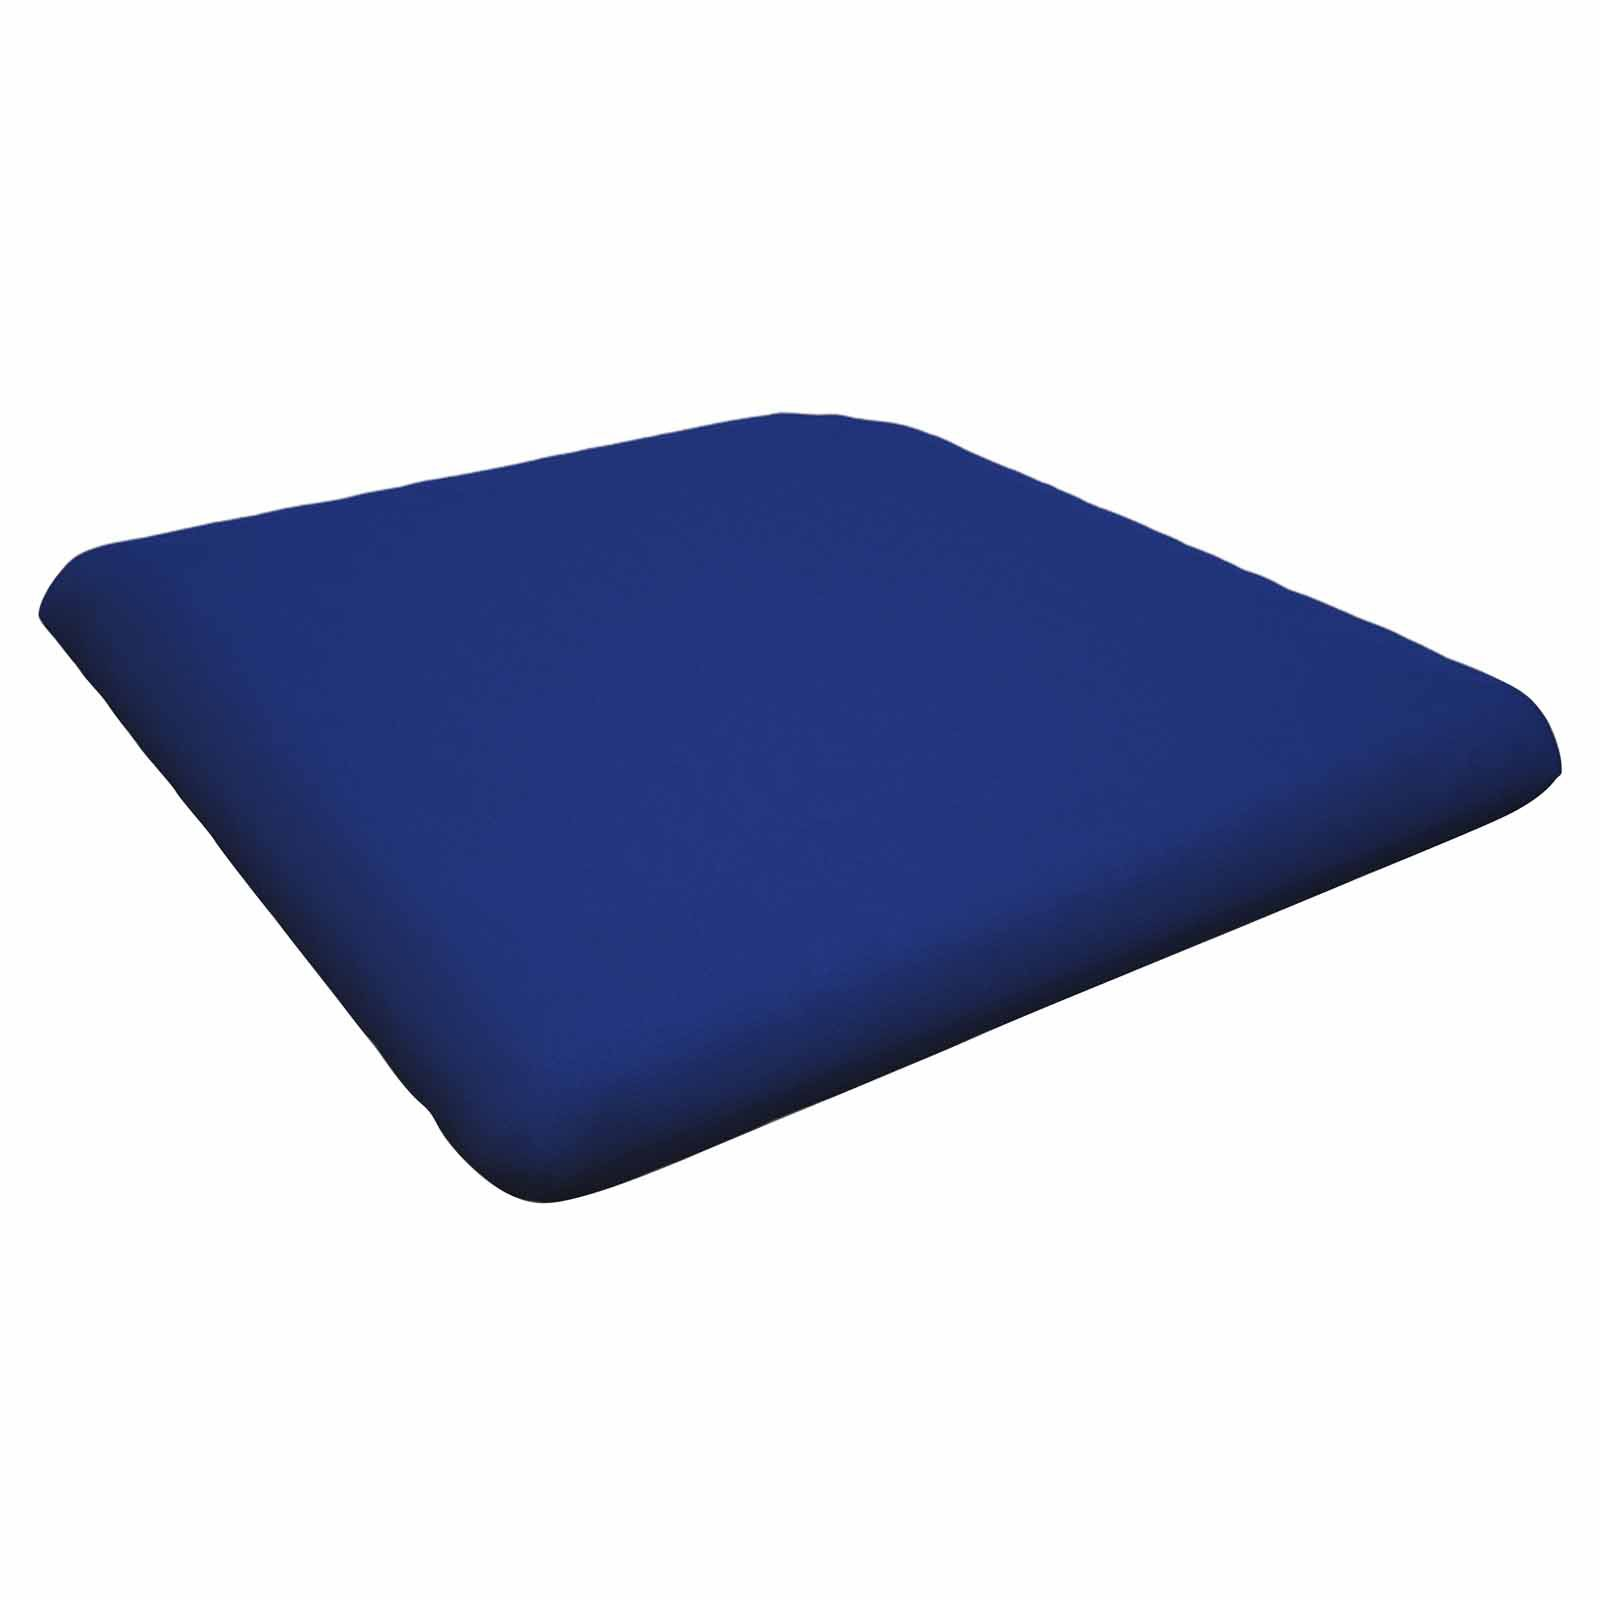 POLYWOOD® Sunbrella 17 x 17.25 in. Captain Dining Chair Seat Cushion